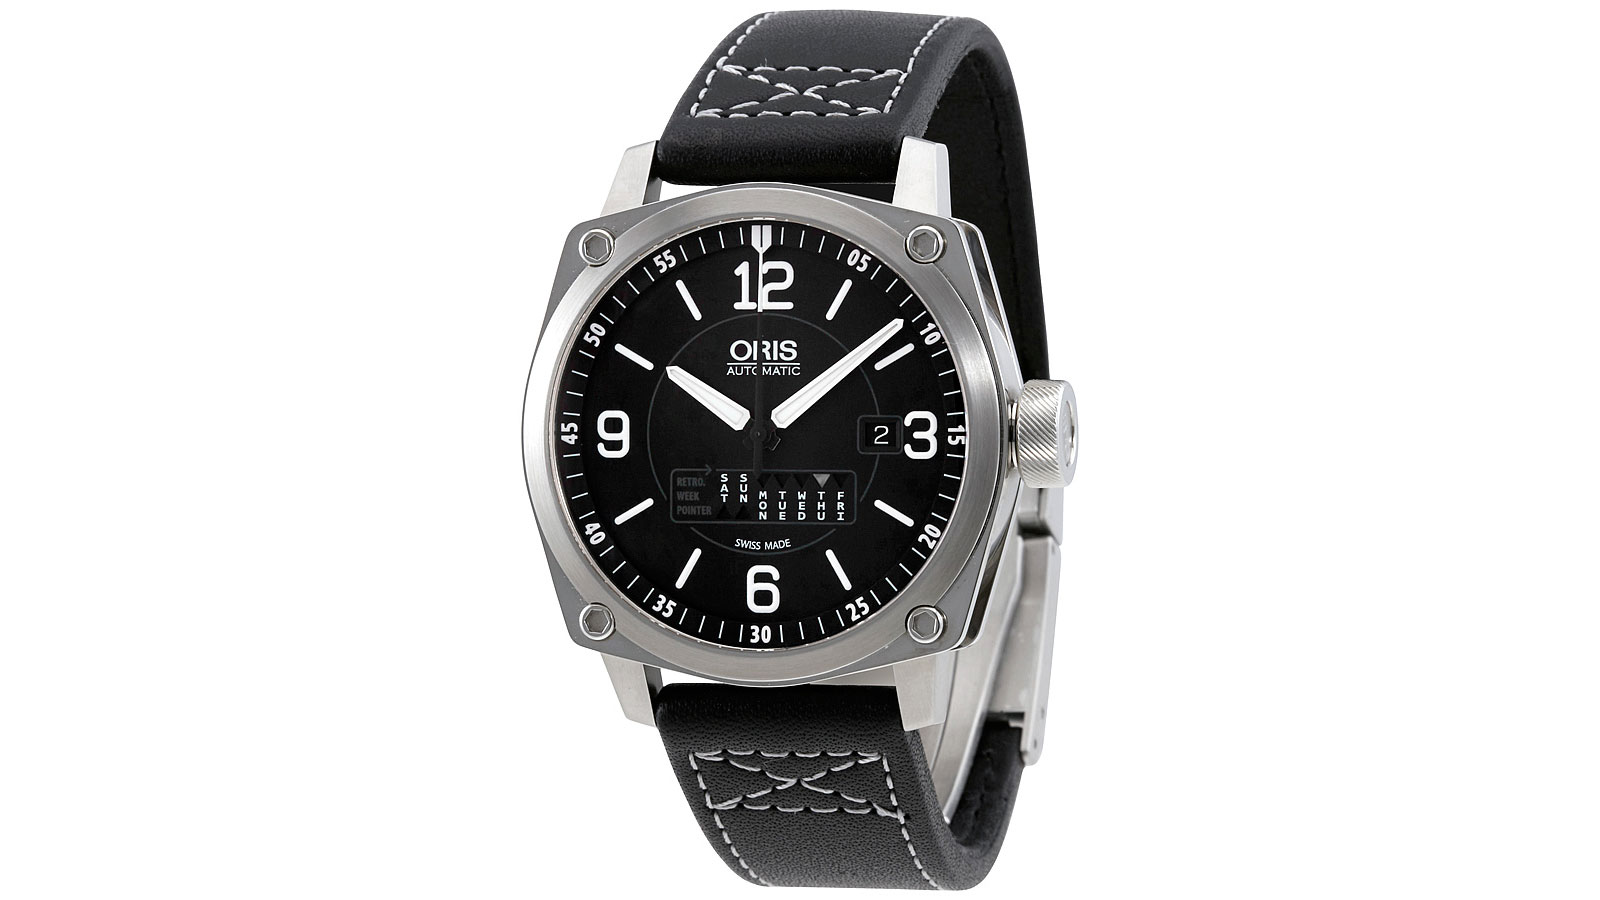 Oris BC4 Retrograde Day Automatic Men's Watch | best men's watches under $1000